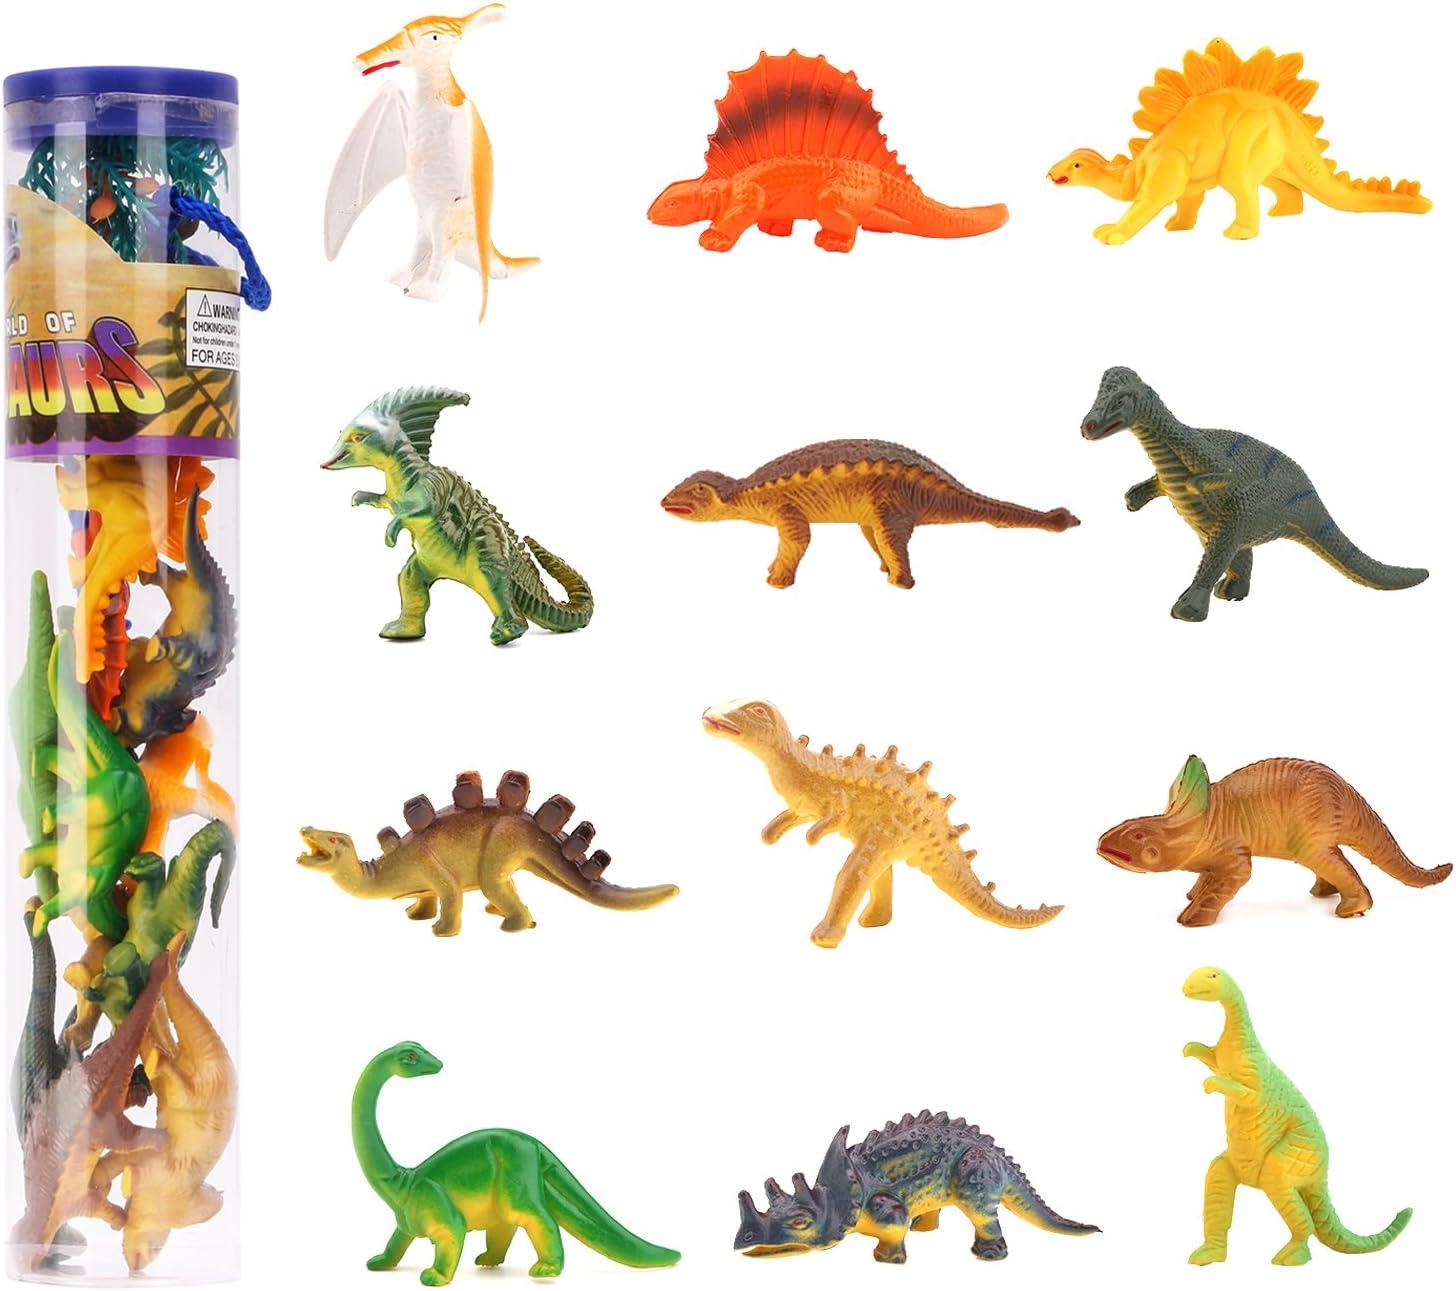 Zooawa Mini Dinosaur Inexpensive Toys 12 Pcs Assort Ranking TOP17 Play Set